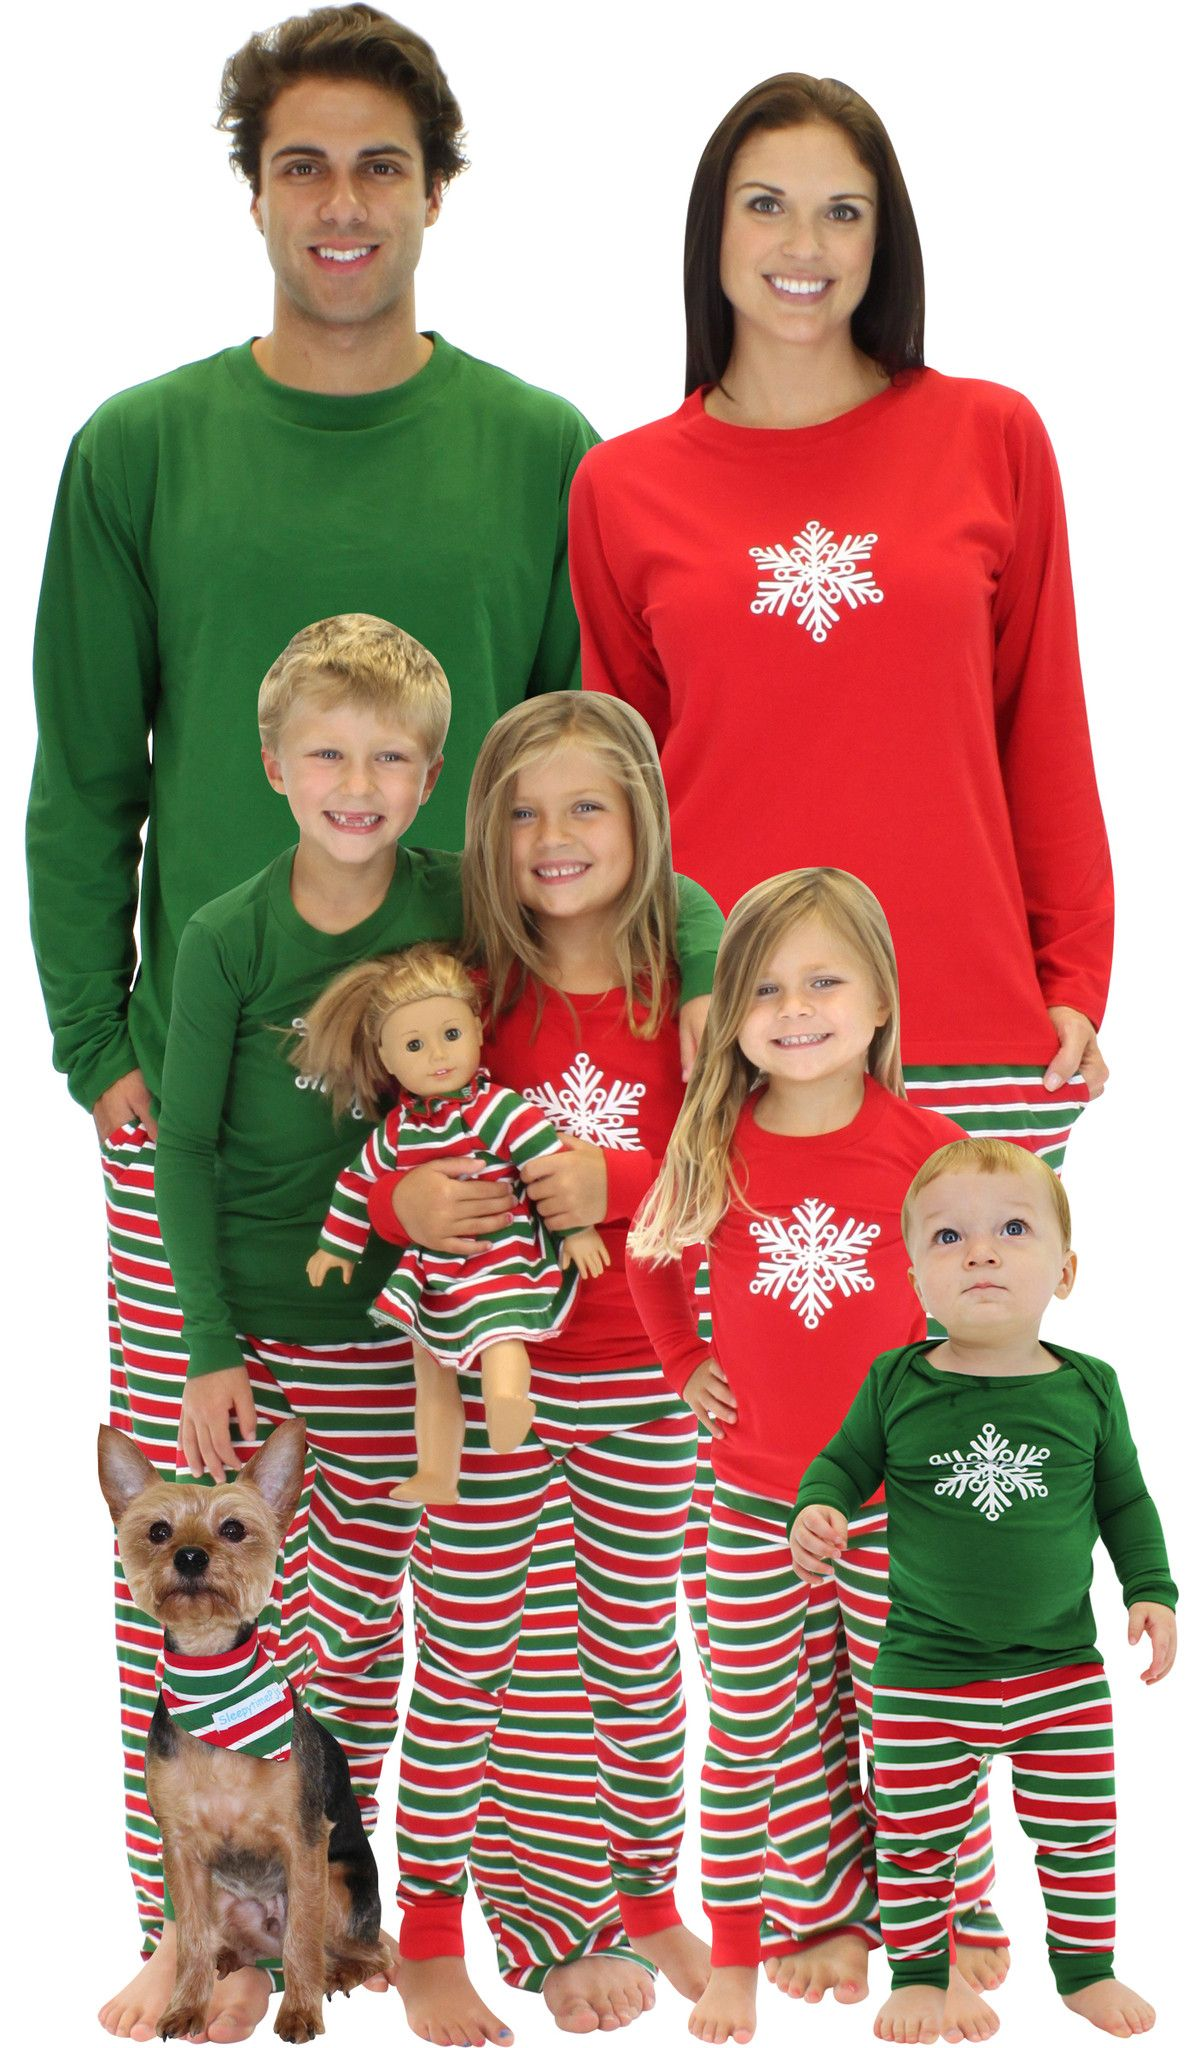 The Most Adorable Christmas Pajamas For The Whole Family Family Christmas Pajamas Matching Family Christmas Pajamas Family Pajama Sets